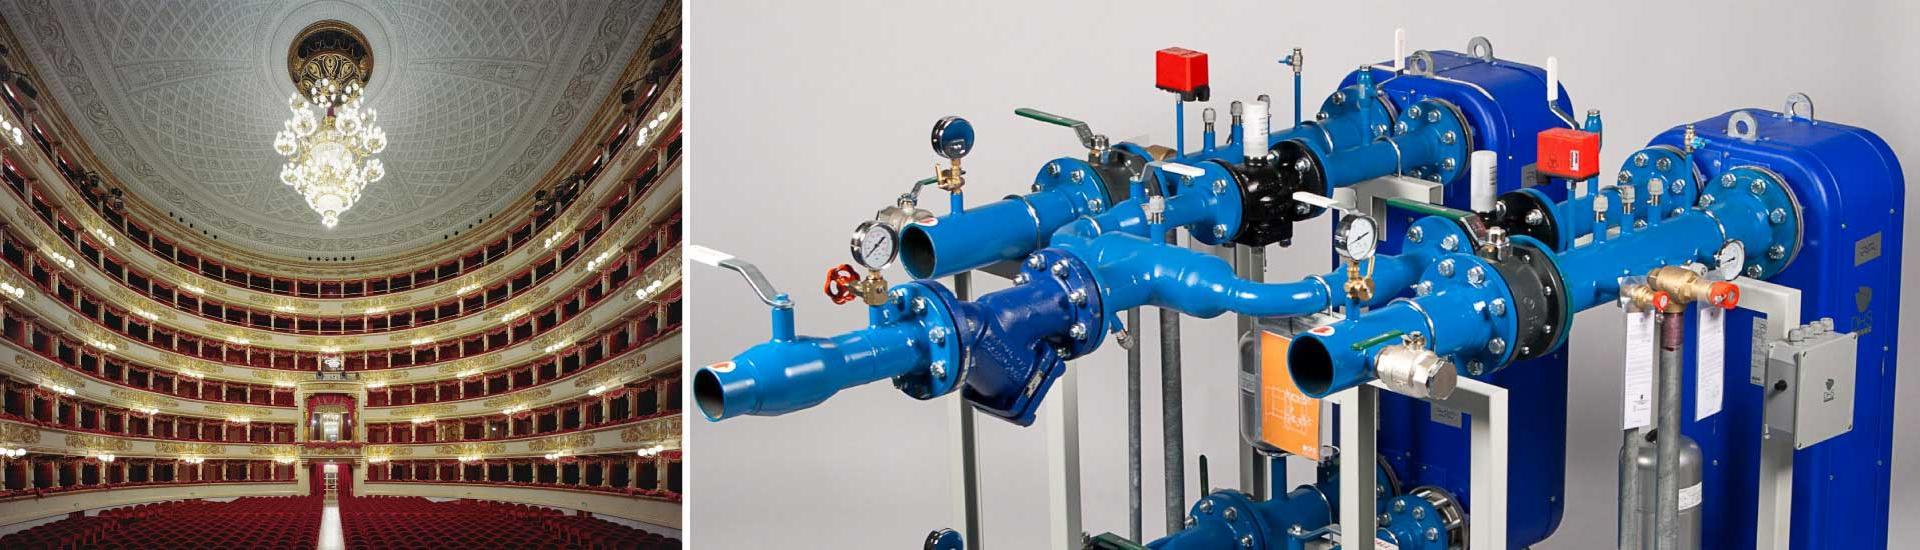 AMARC DHS substations heat the TEATRO ALLA SCALA